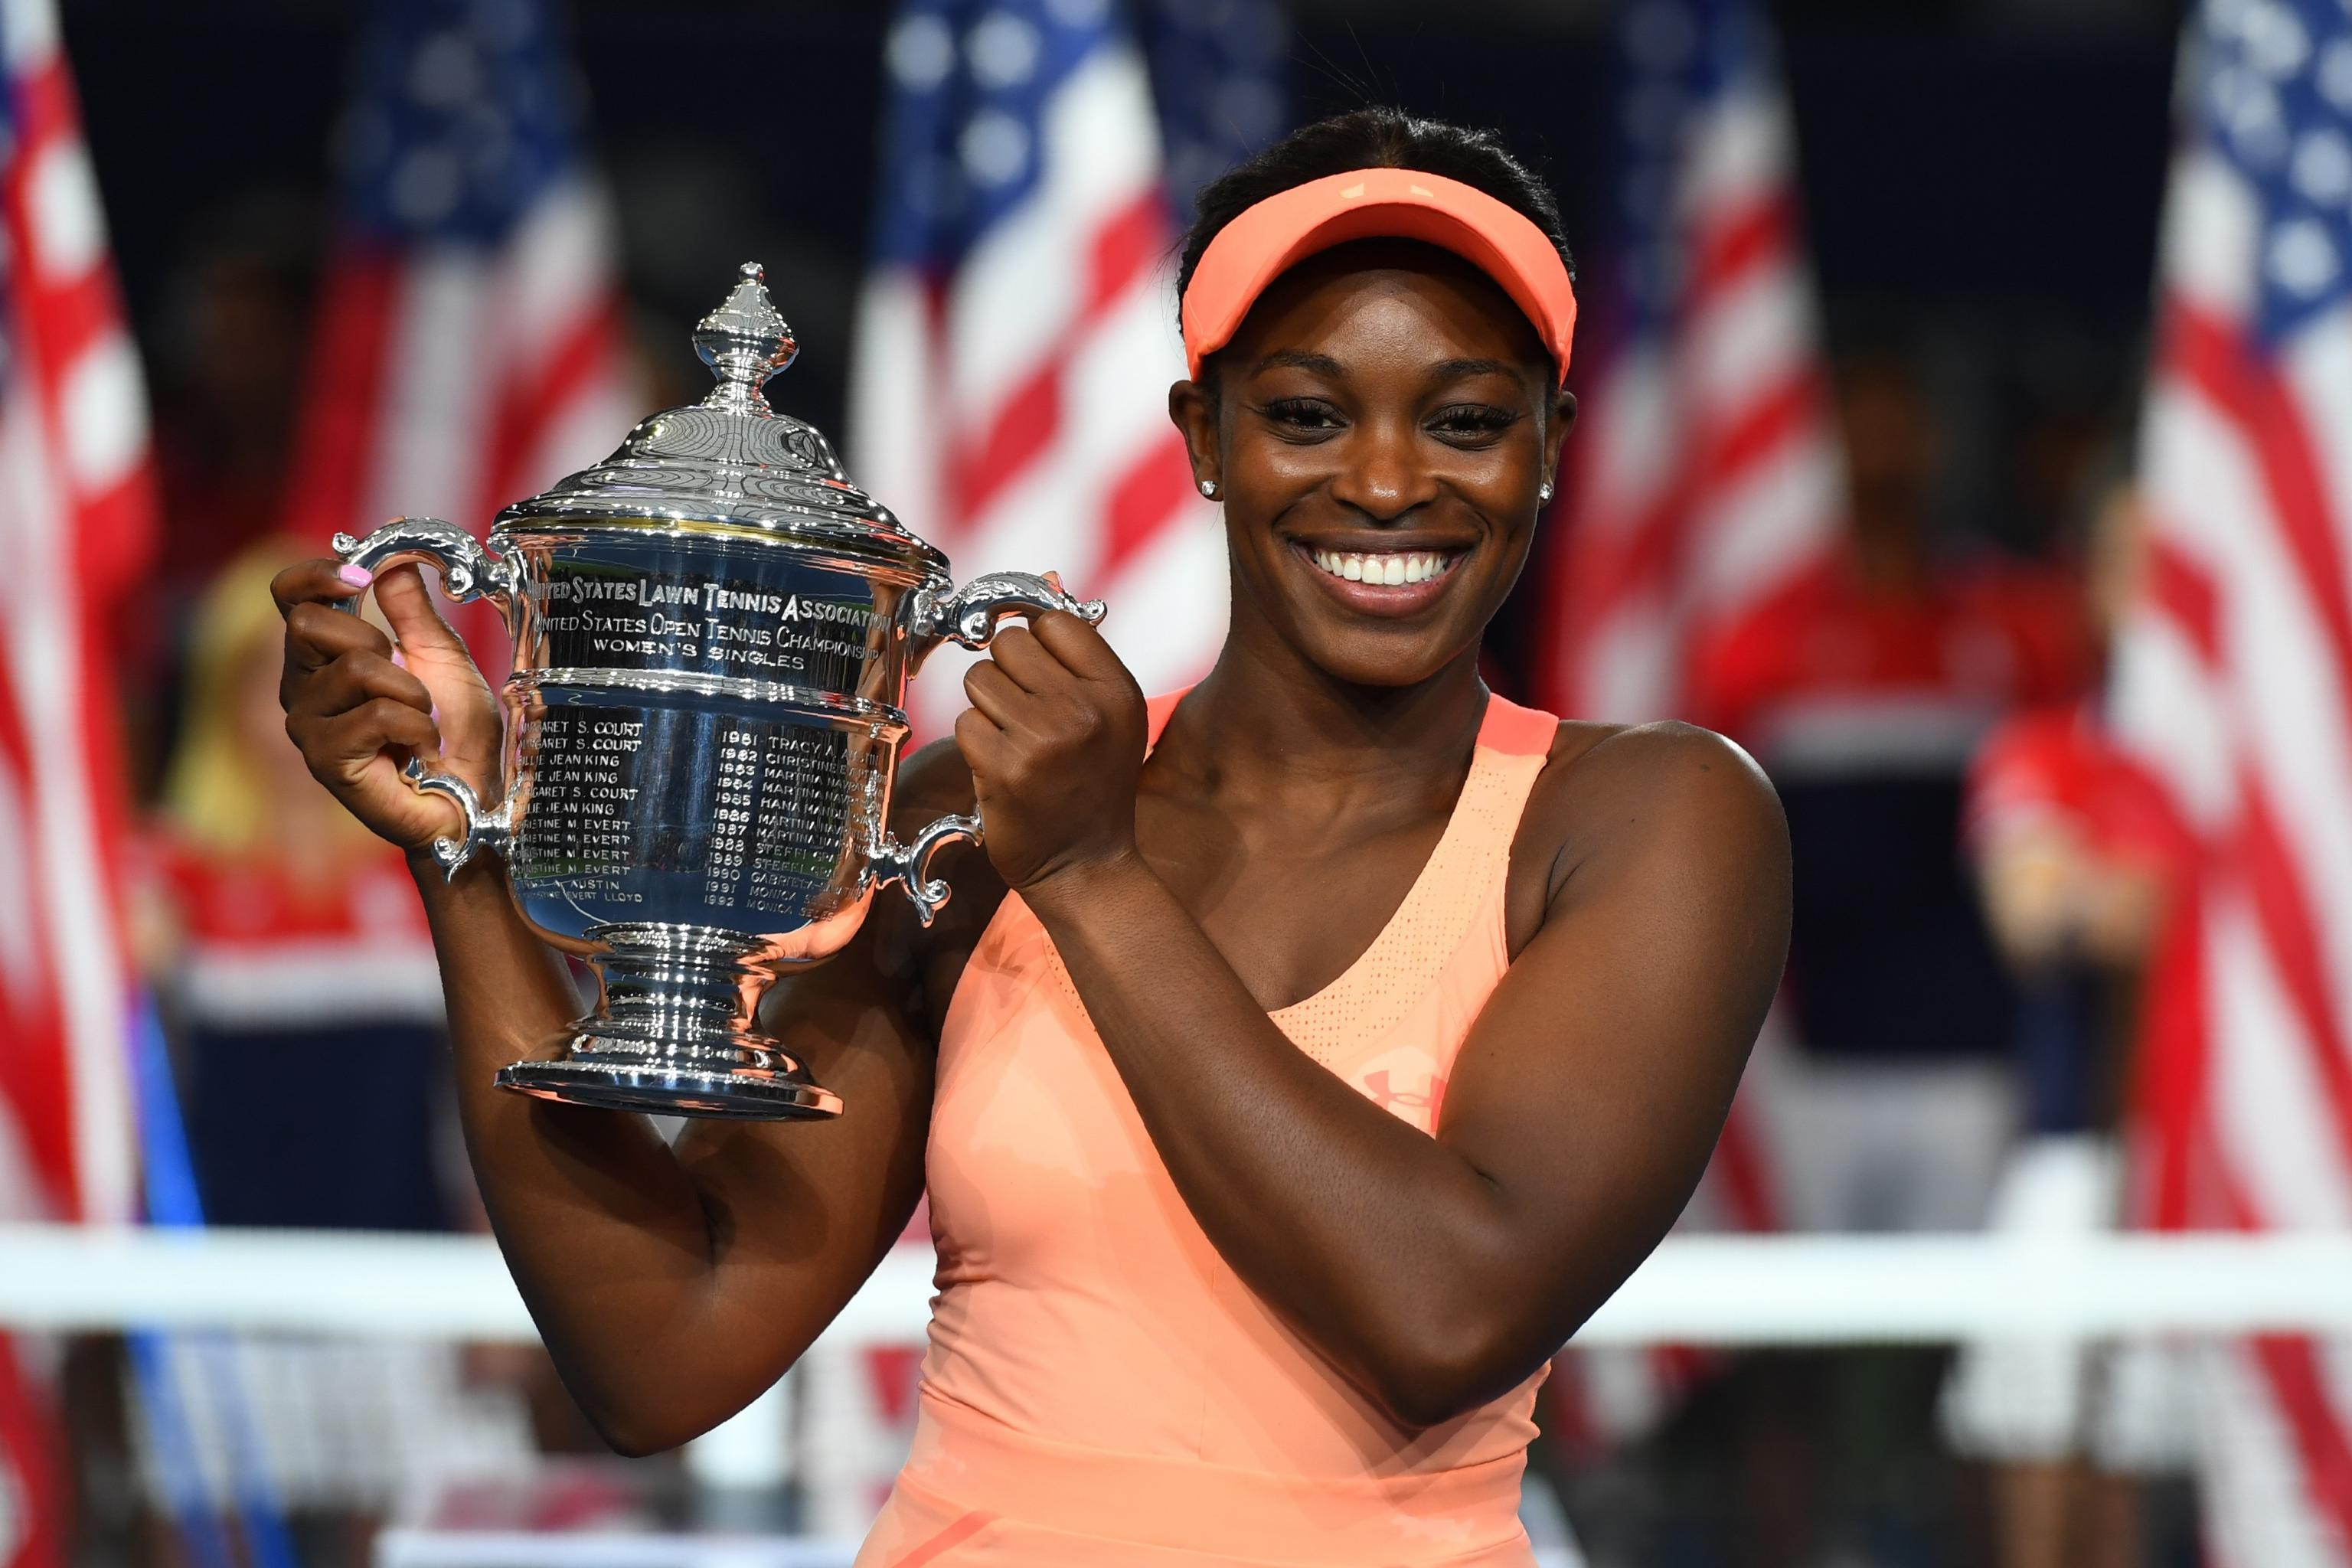 Us Open Tennis 2017 Women S Final Sloane Stephens Wins 1st Grand Slam Bleacher Report Latest News Videos And Highlights